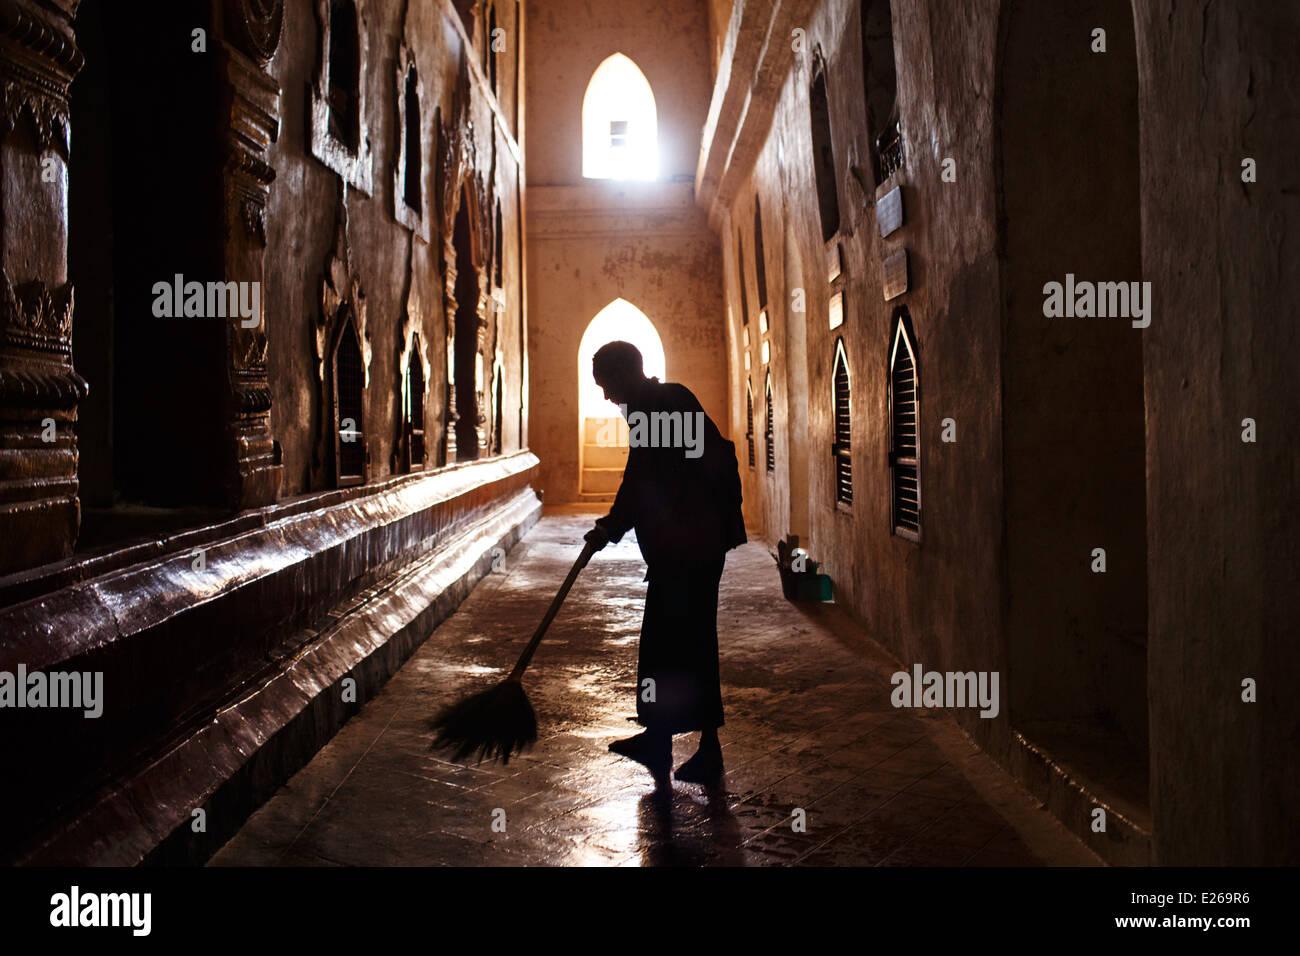 A man sweeping the floor at Ananda Pahto temple in Bagan, Myanmar Burma - Stock Image